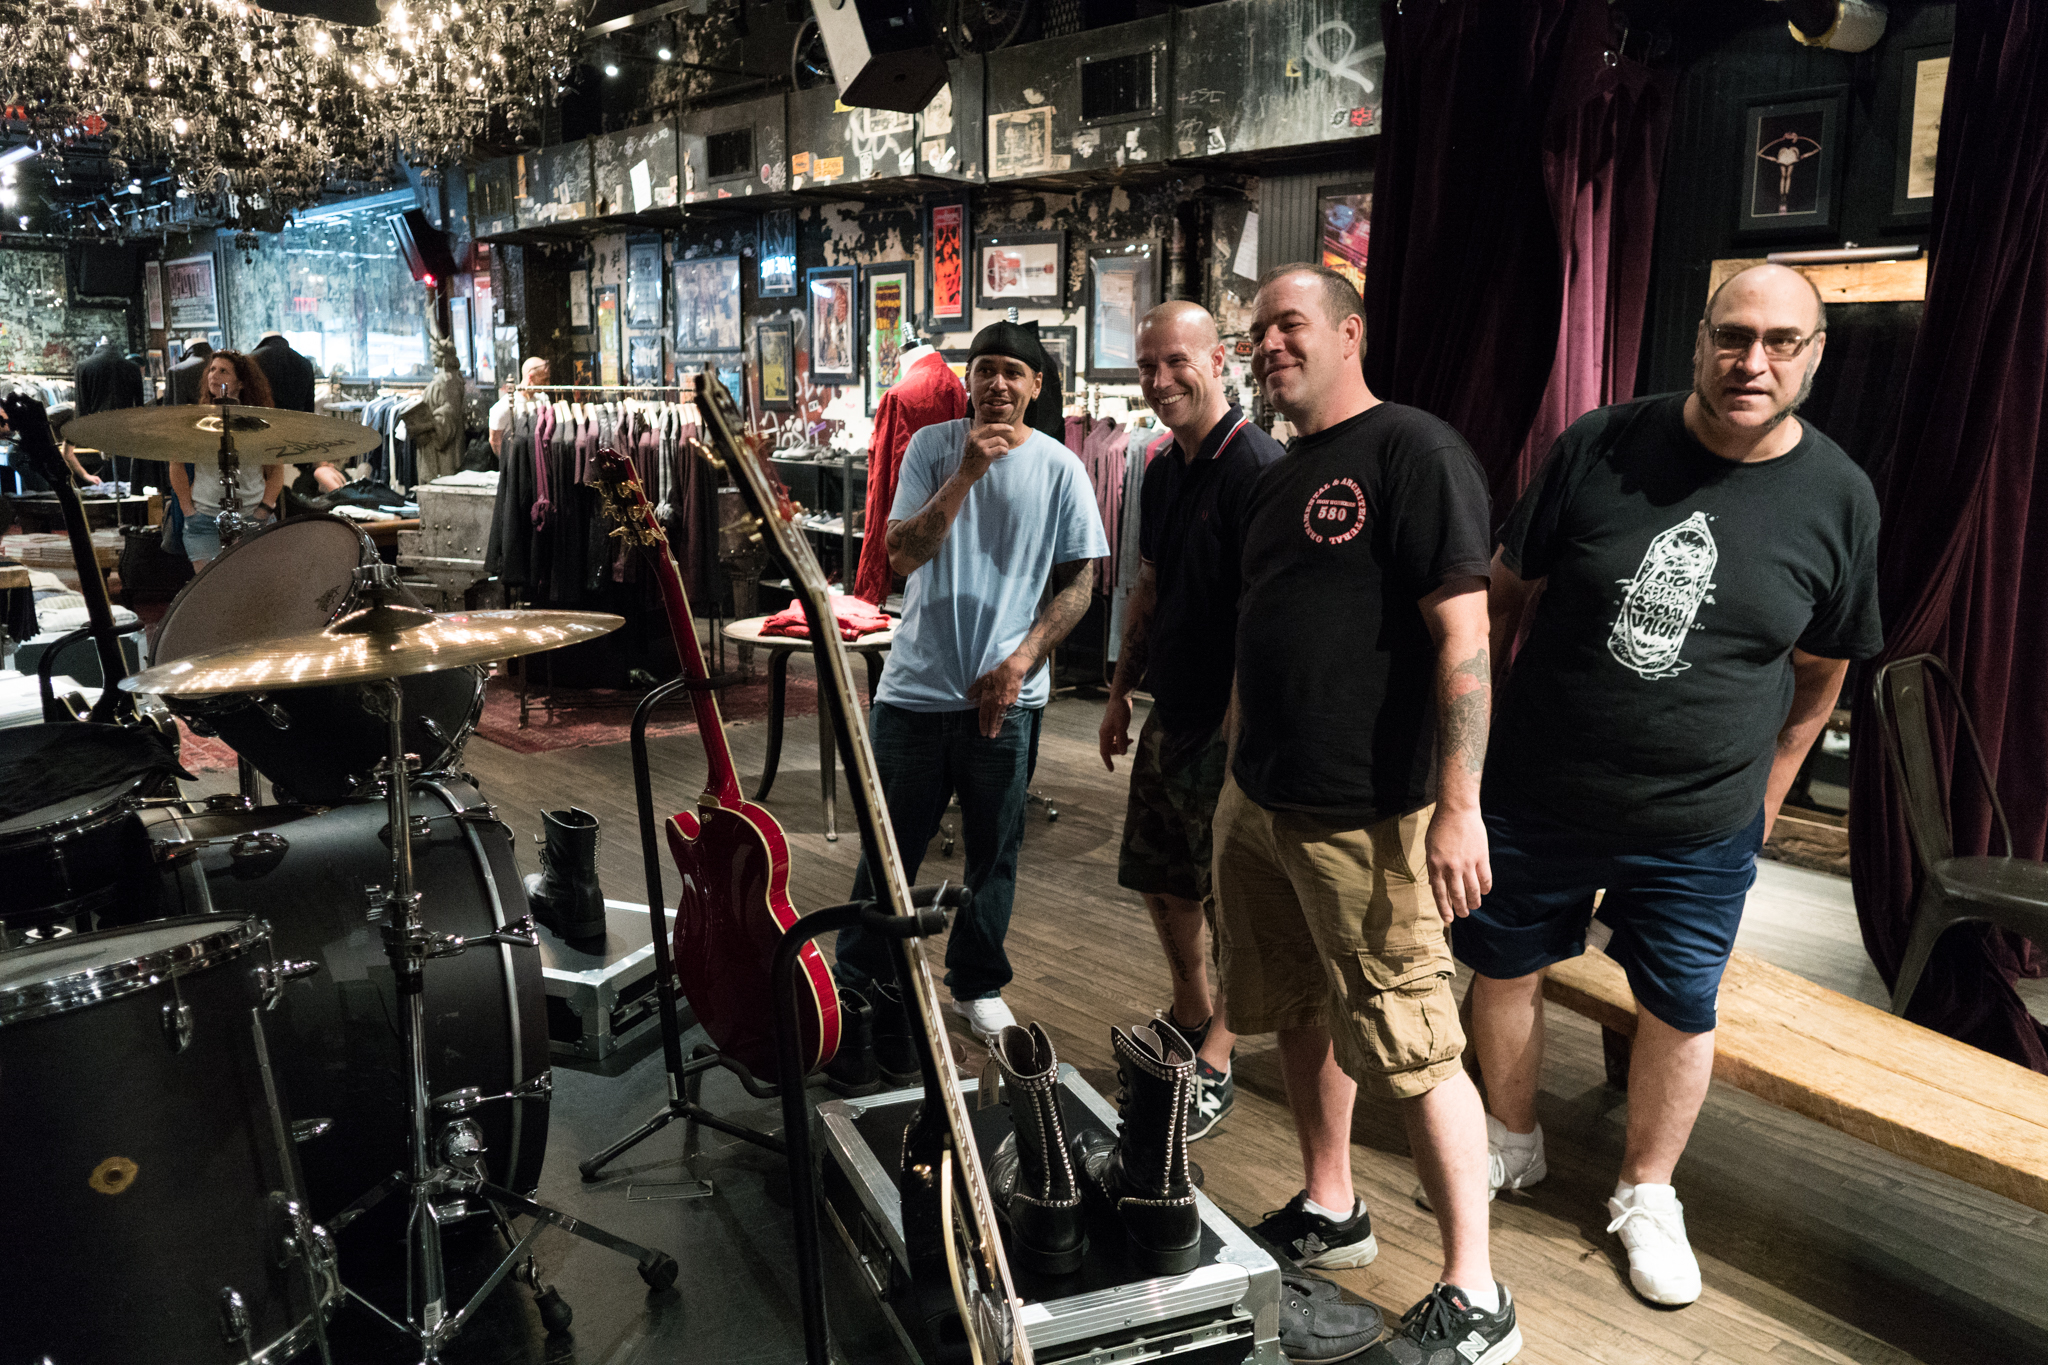 Left to Right: Cesar Ramirez, Kent Miller, Lenny Bednarz, Alan at John Varvatos, the former location of CBGB's.